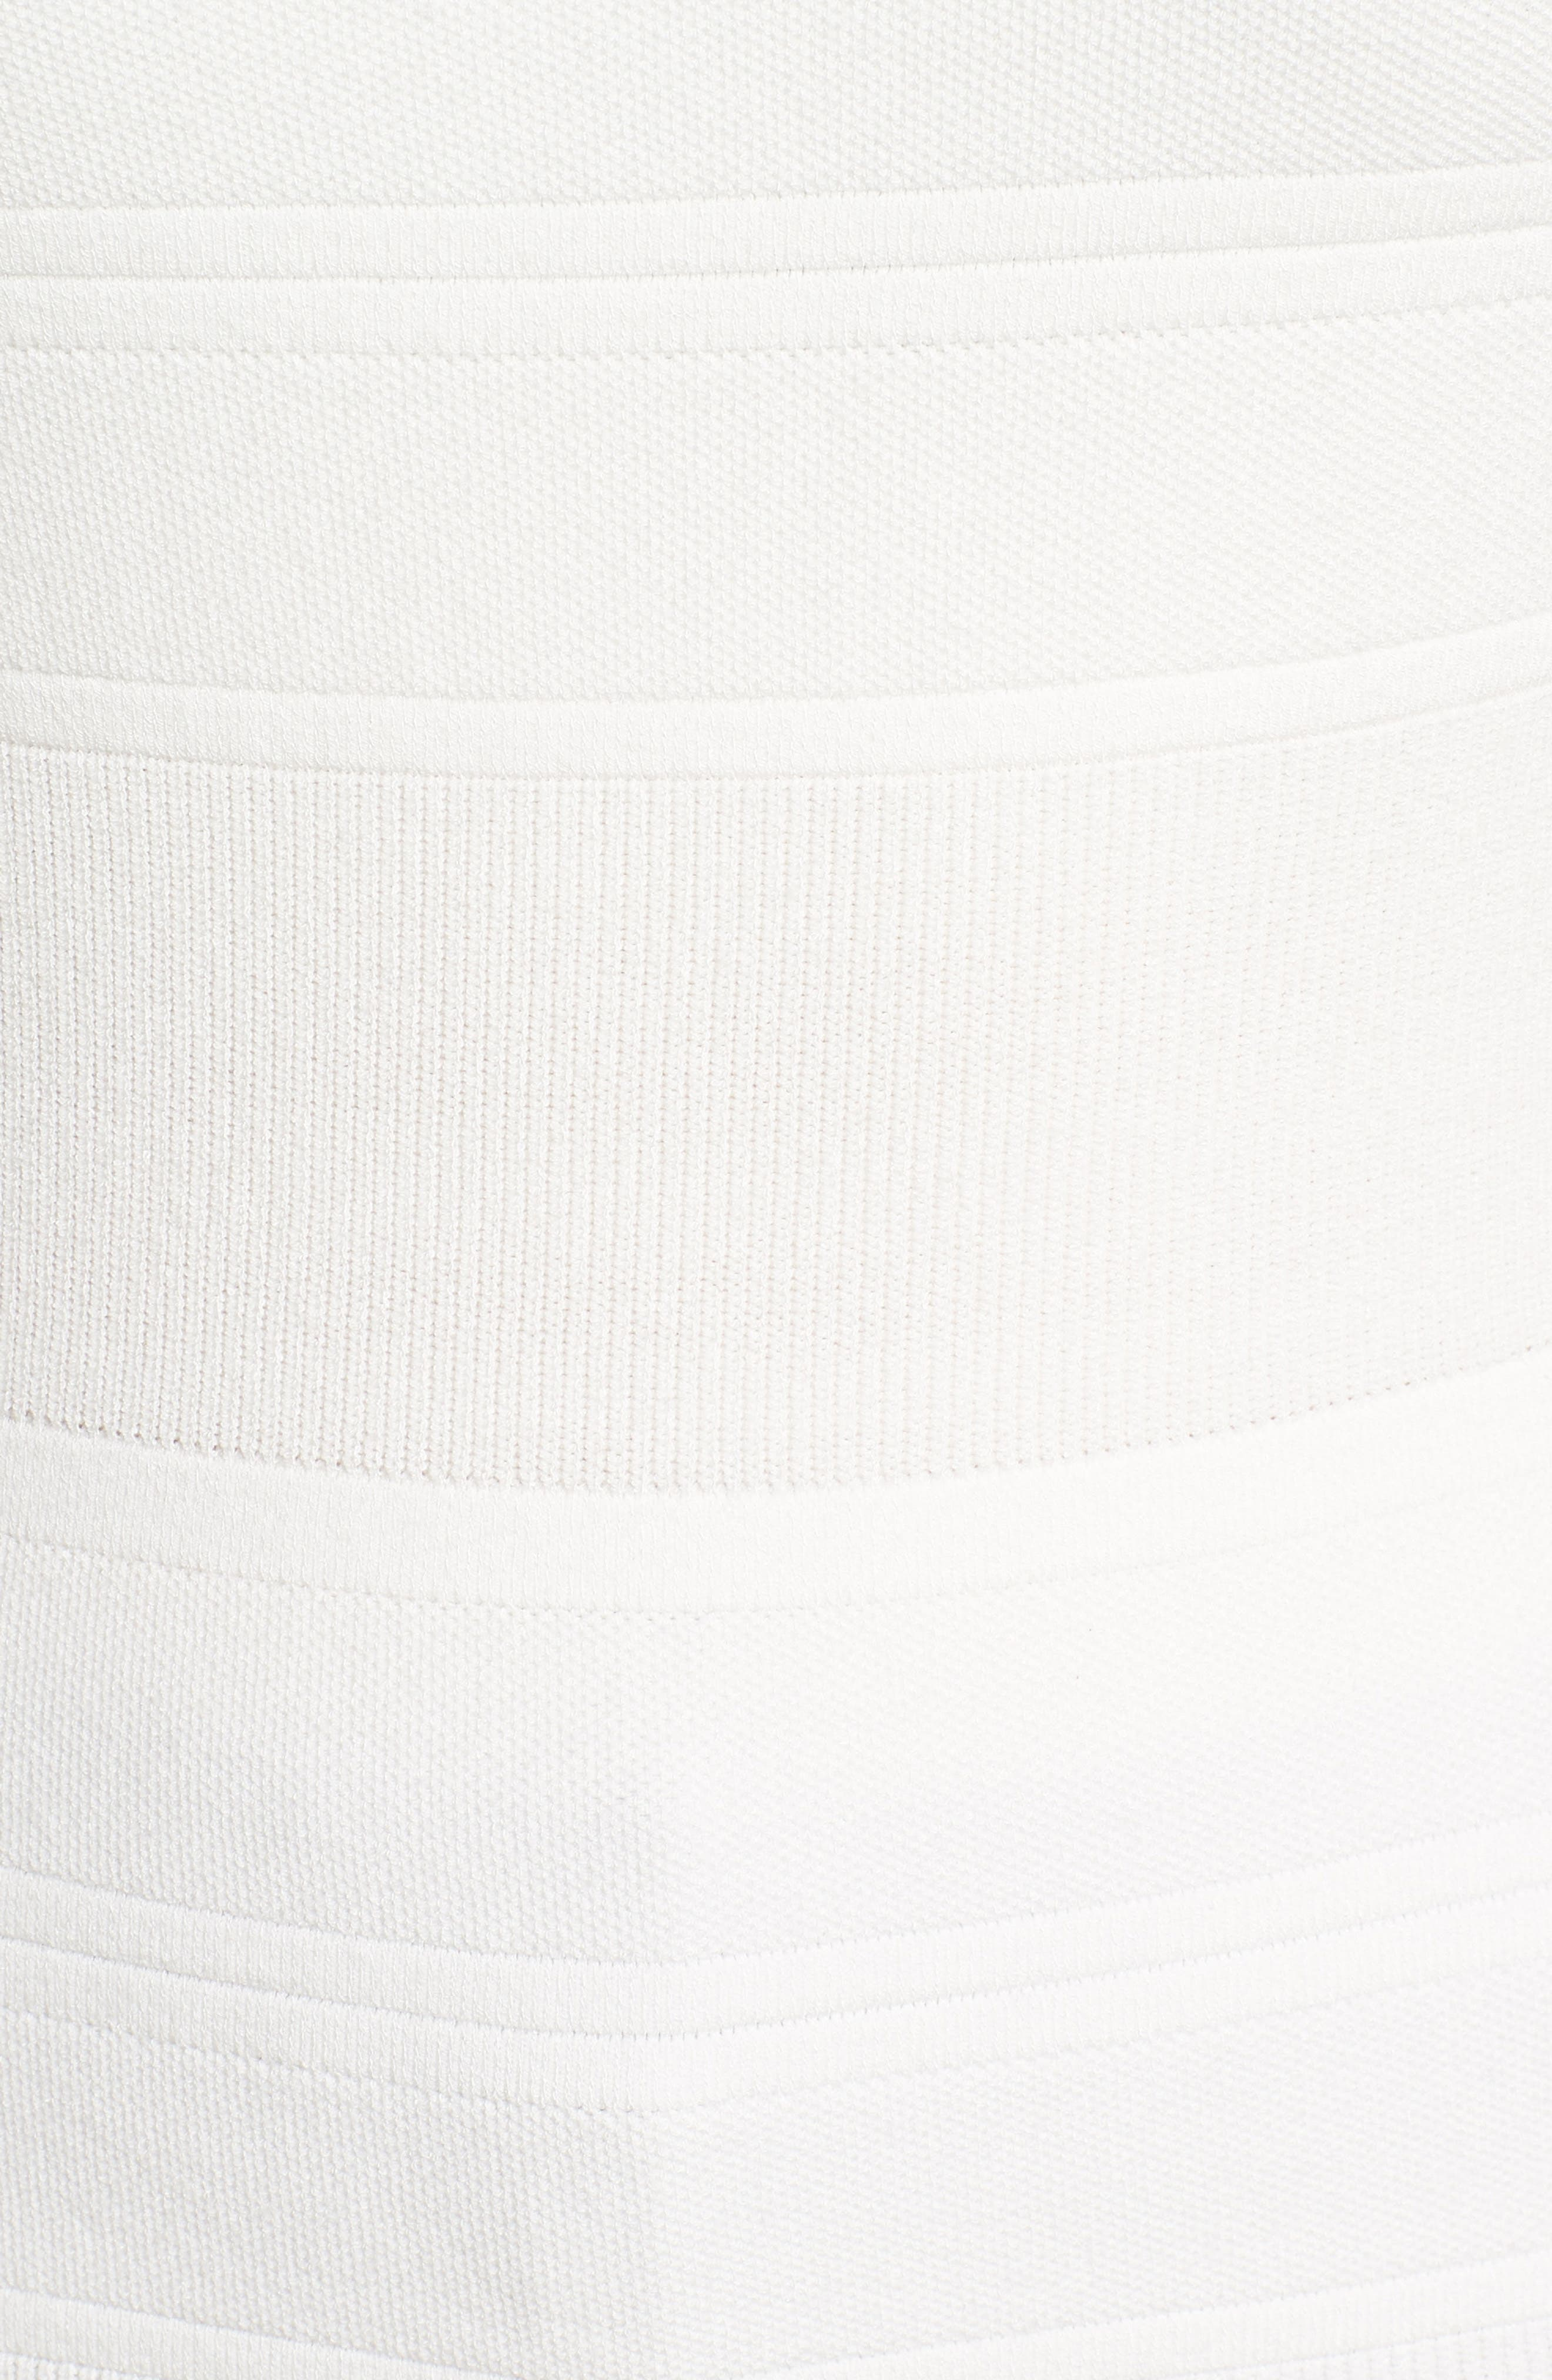 Finami Sweater,                             Alternate thumbnail 6, color,                             White